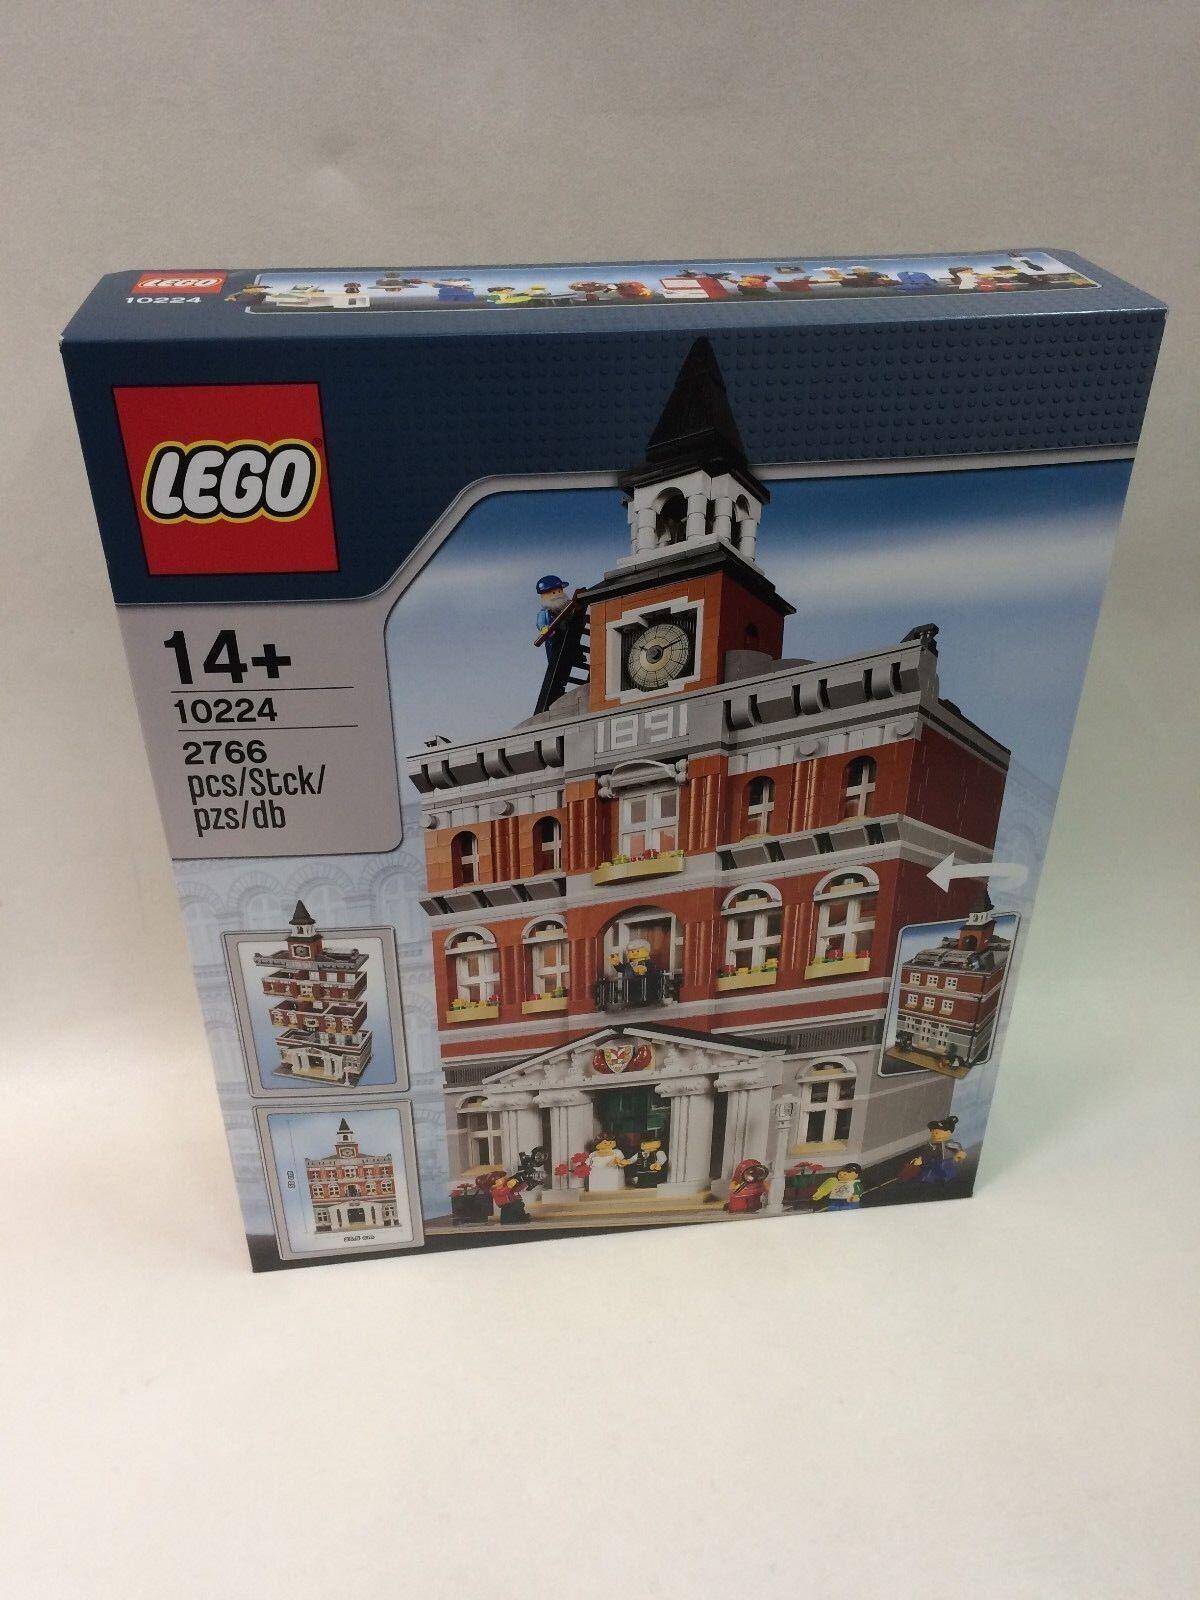 Neuf Scellé LEGO 10224 Town Hall Comme neuf CONDITION